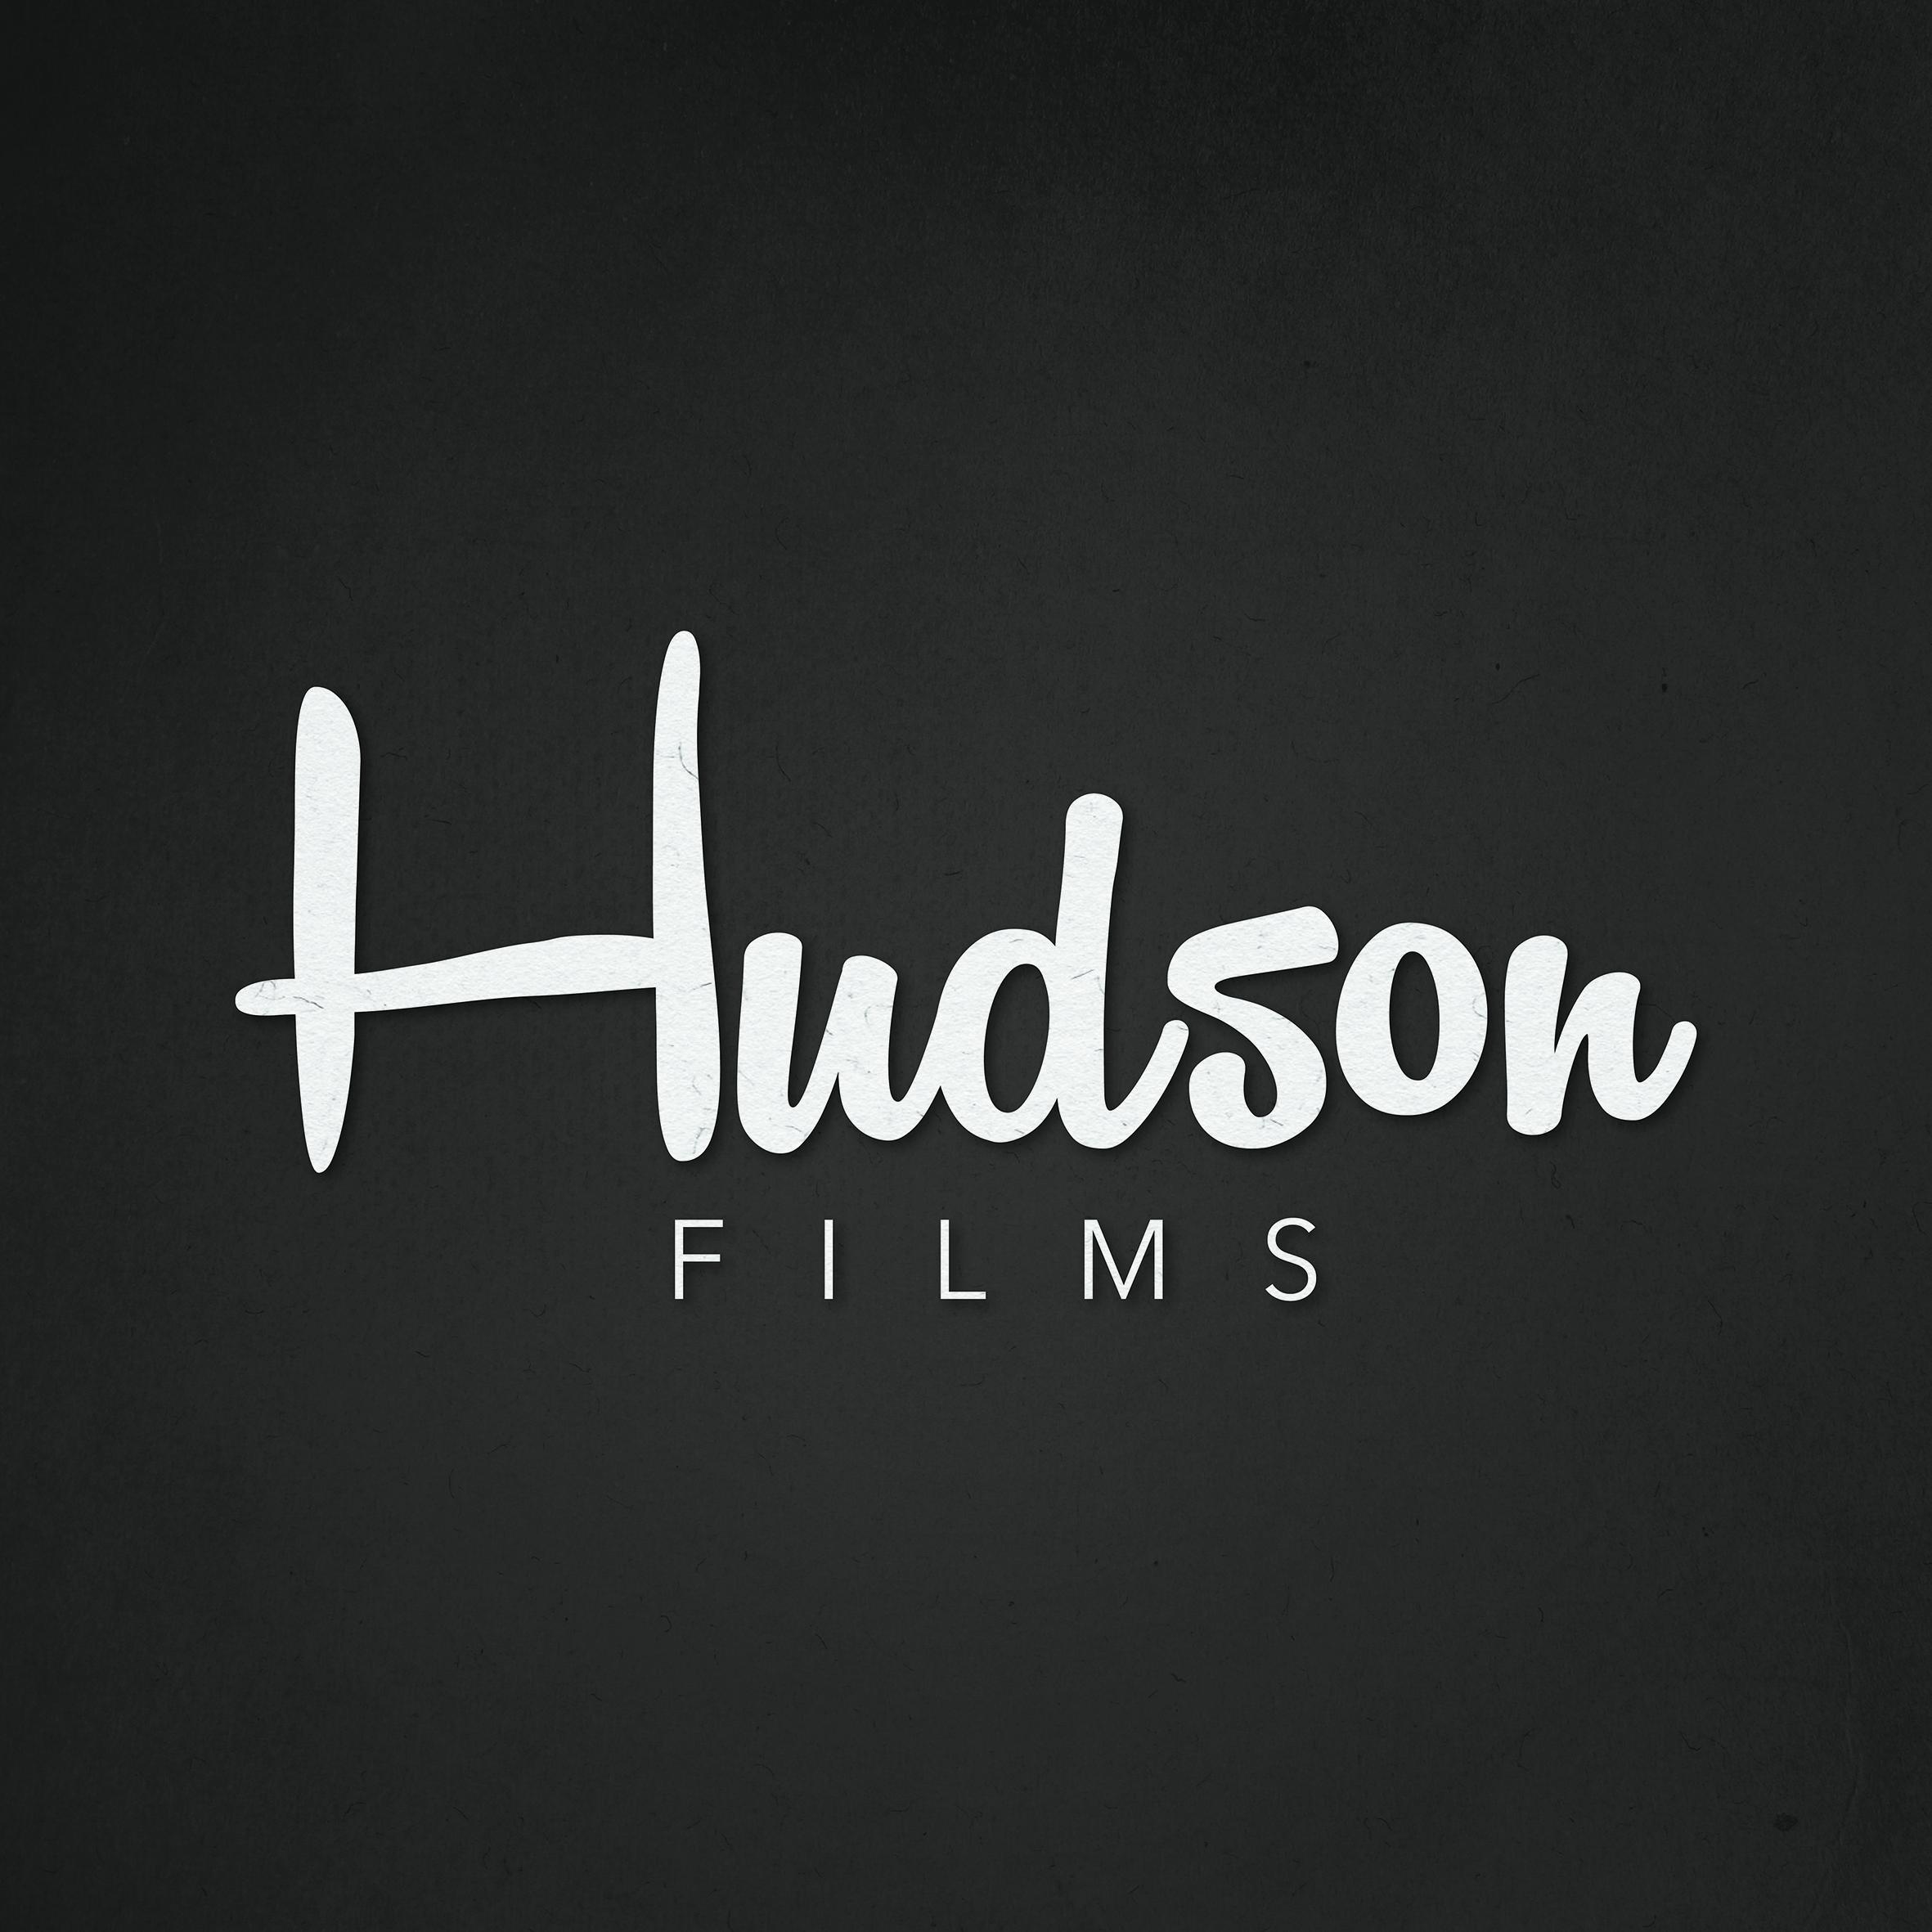 Hudson Films | Logo Design by Corinne Jade